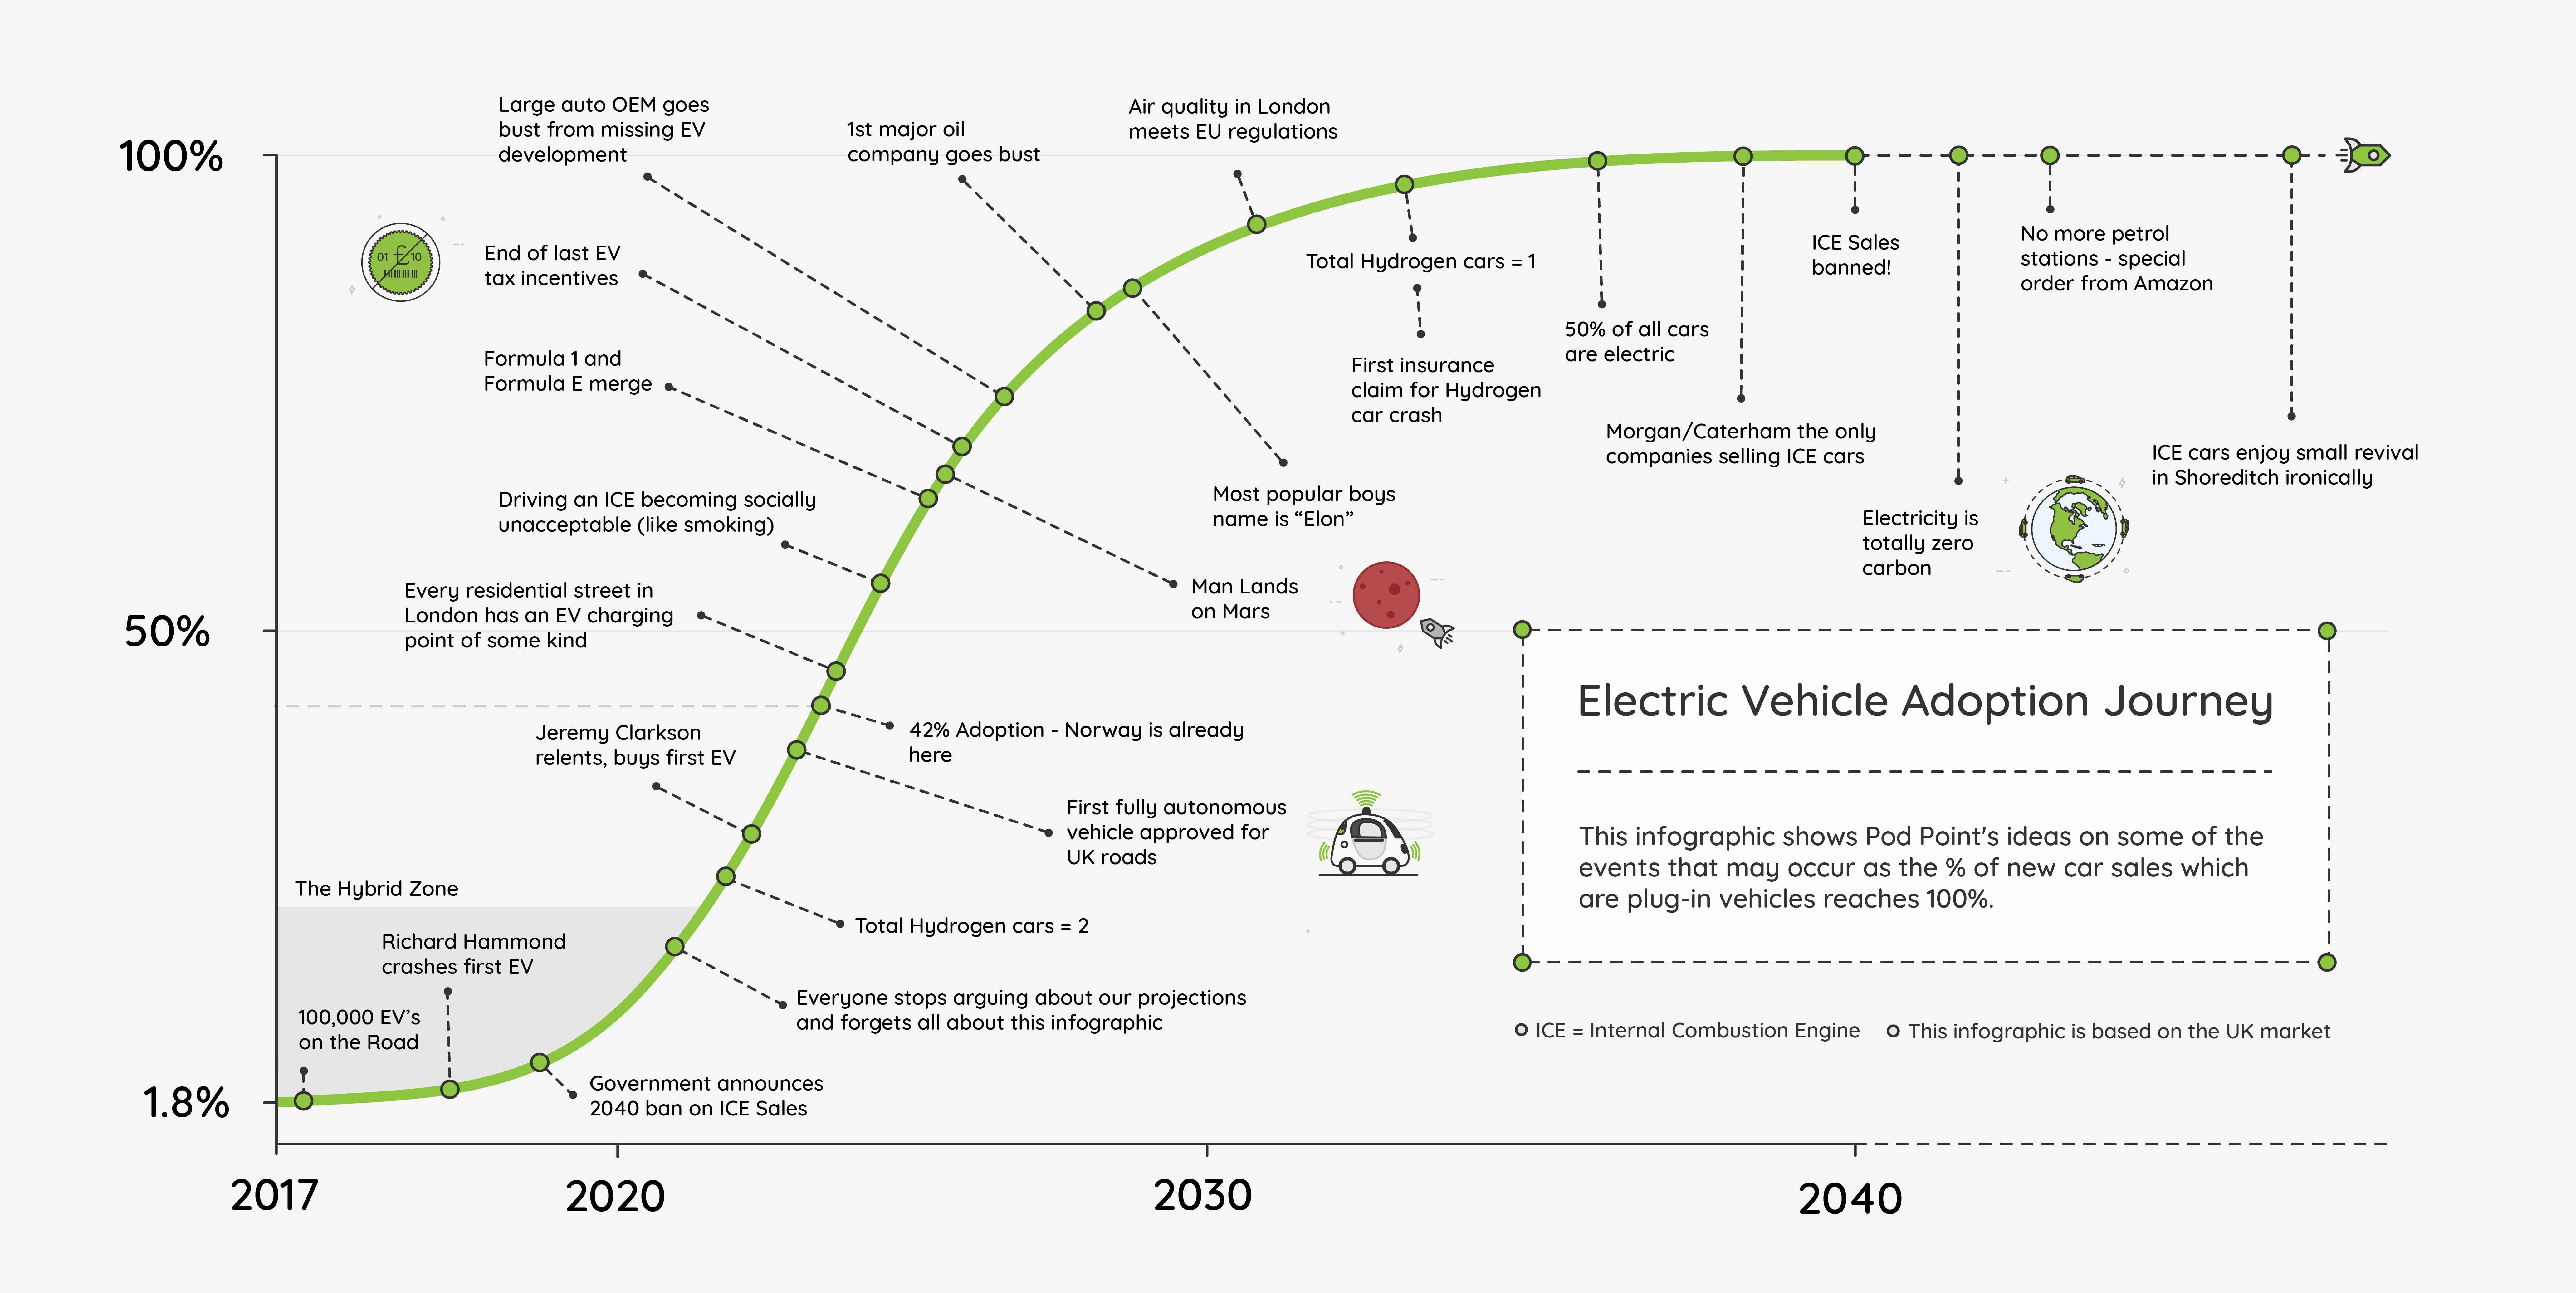 2040 Timeline Infographic